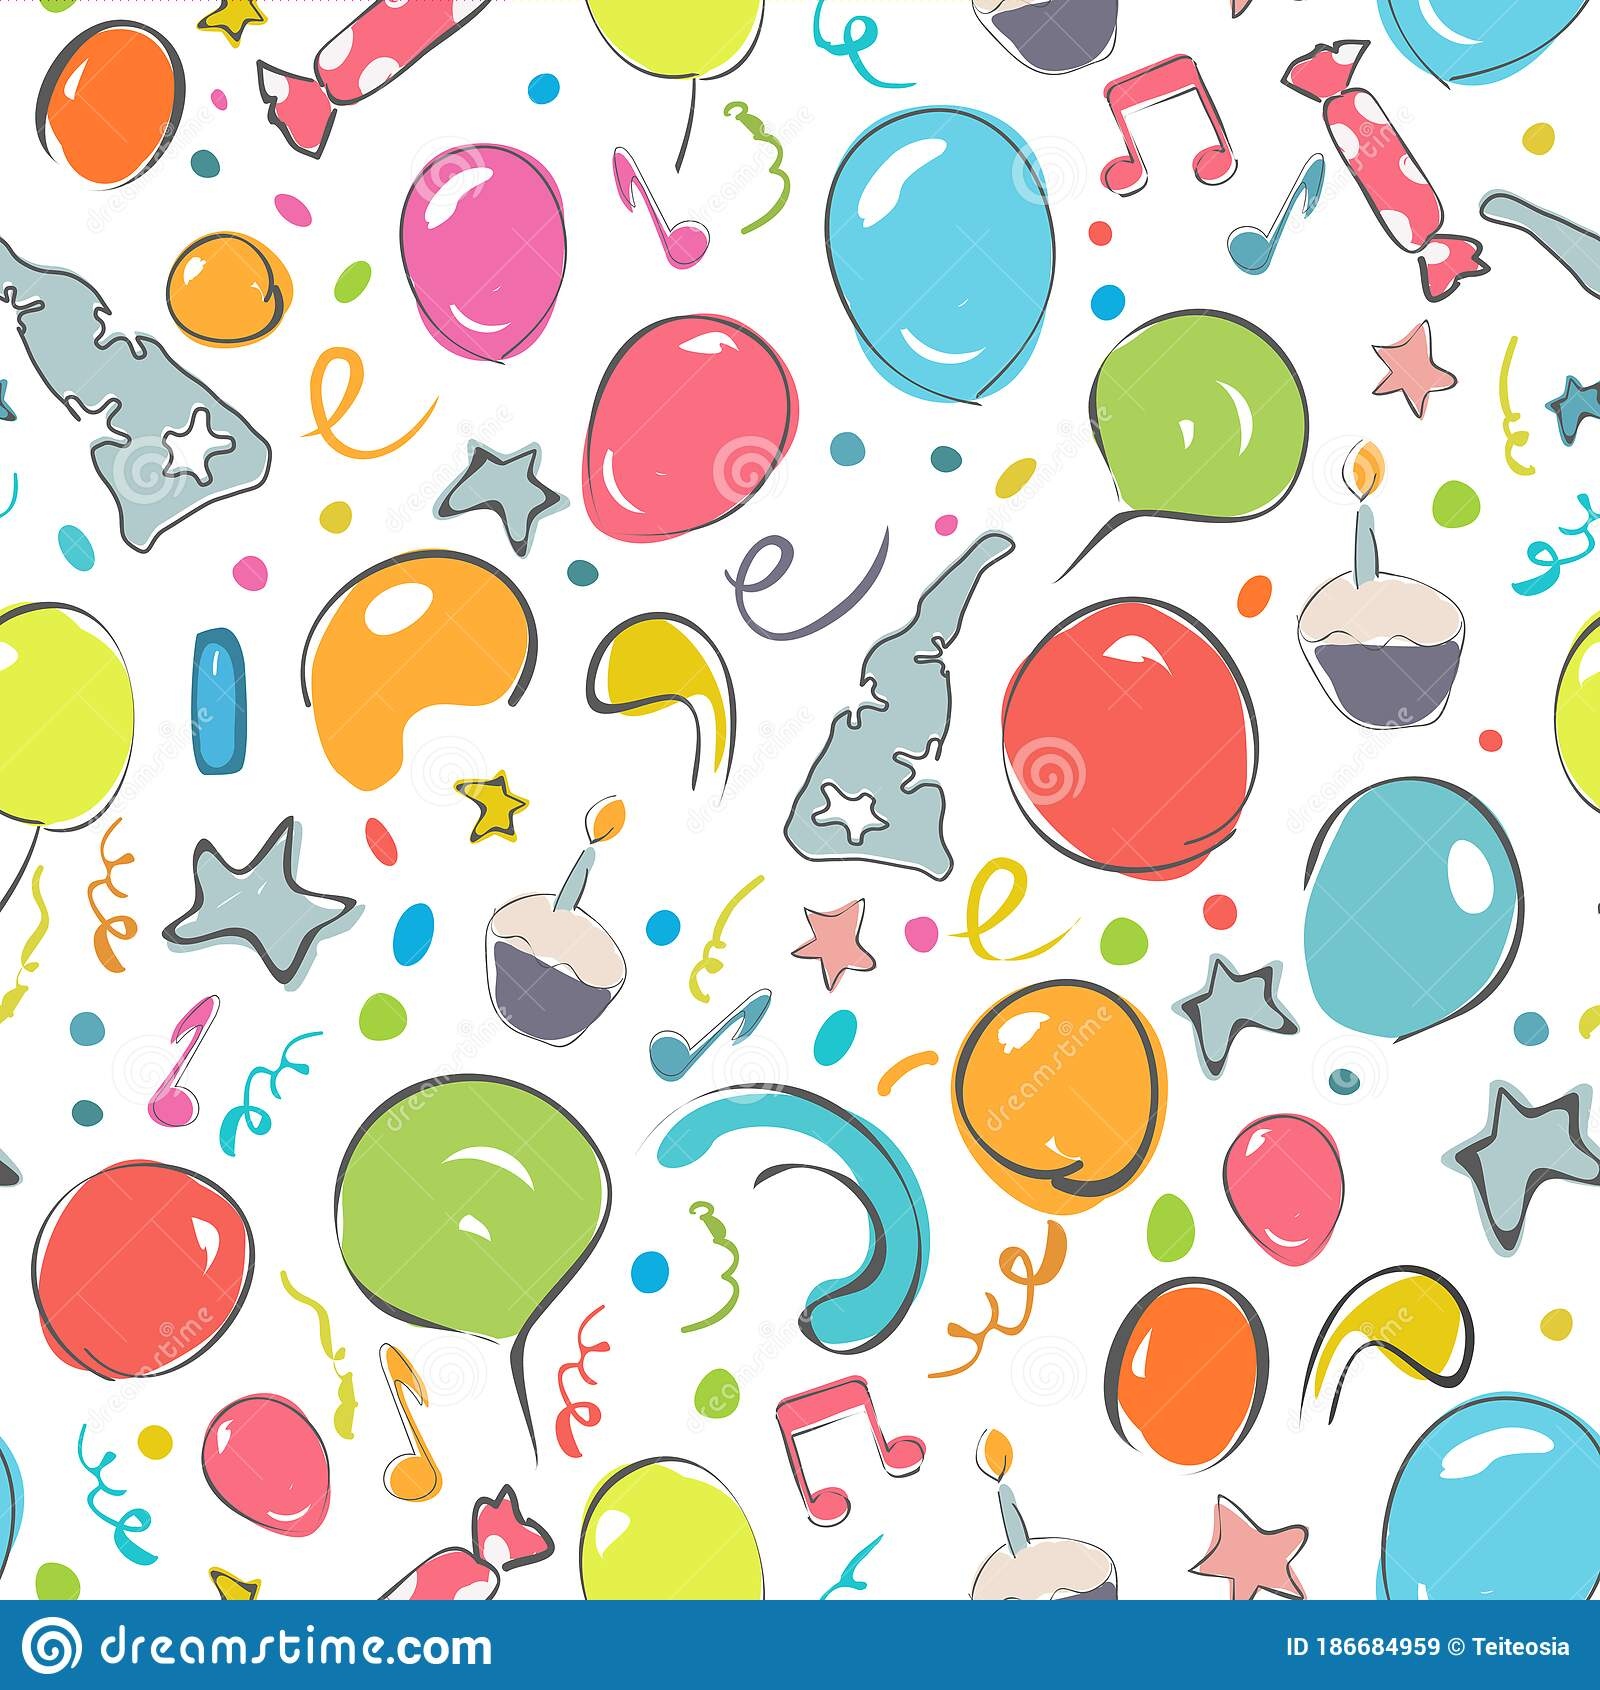 Happy Birthday Seamless Patern Stock Illustration Illustration Of Foliday Greeting 186684959